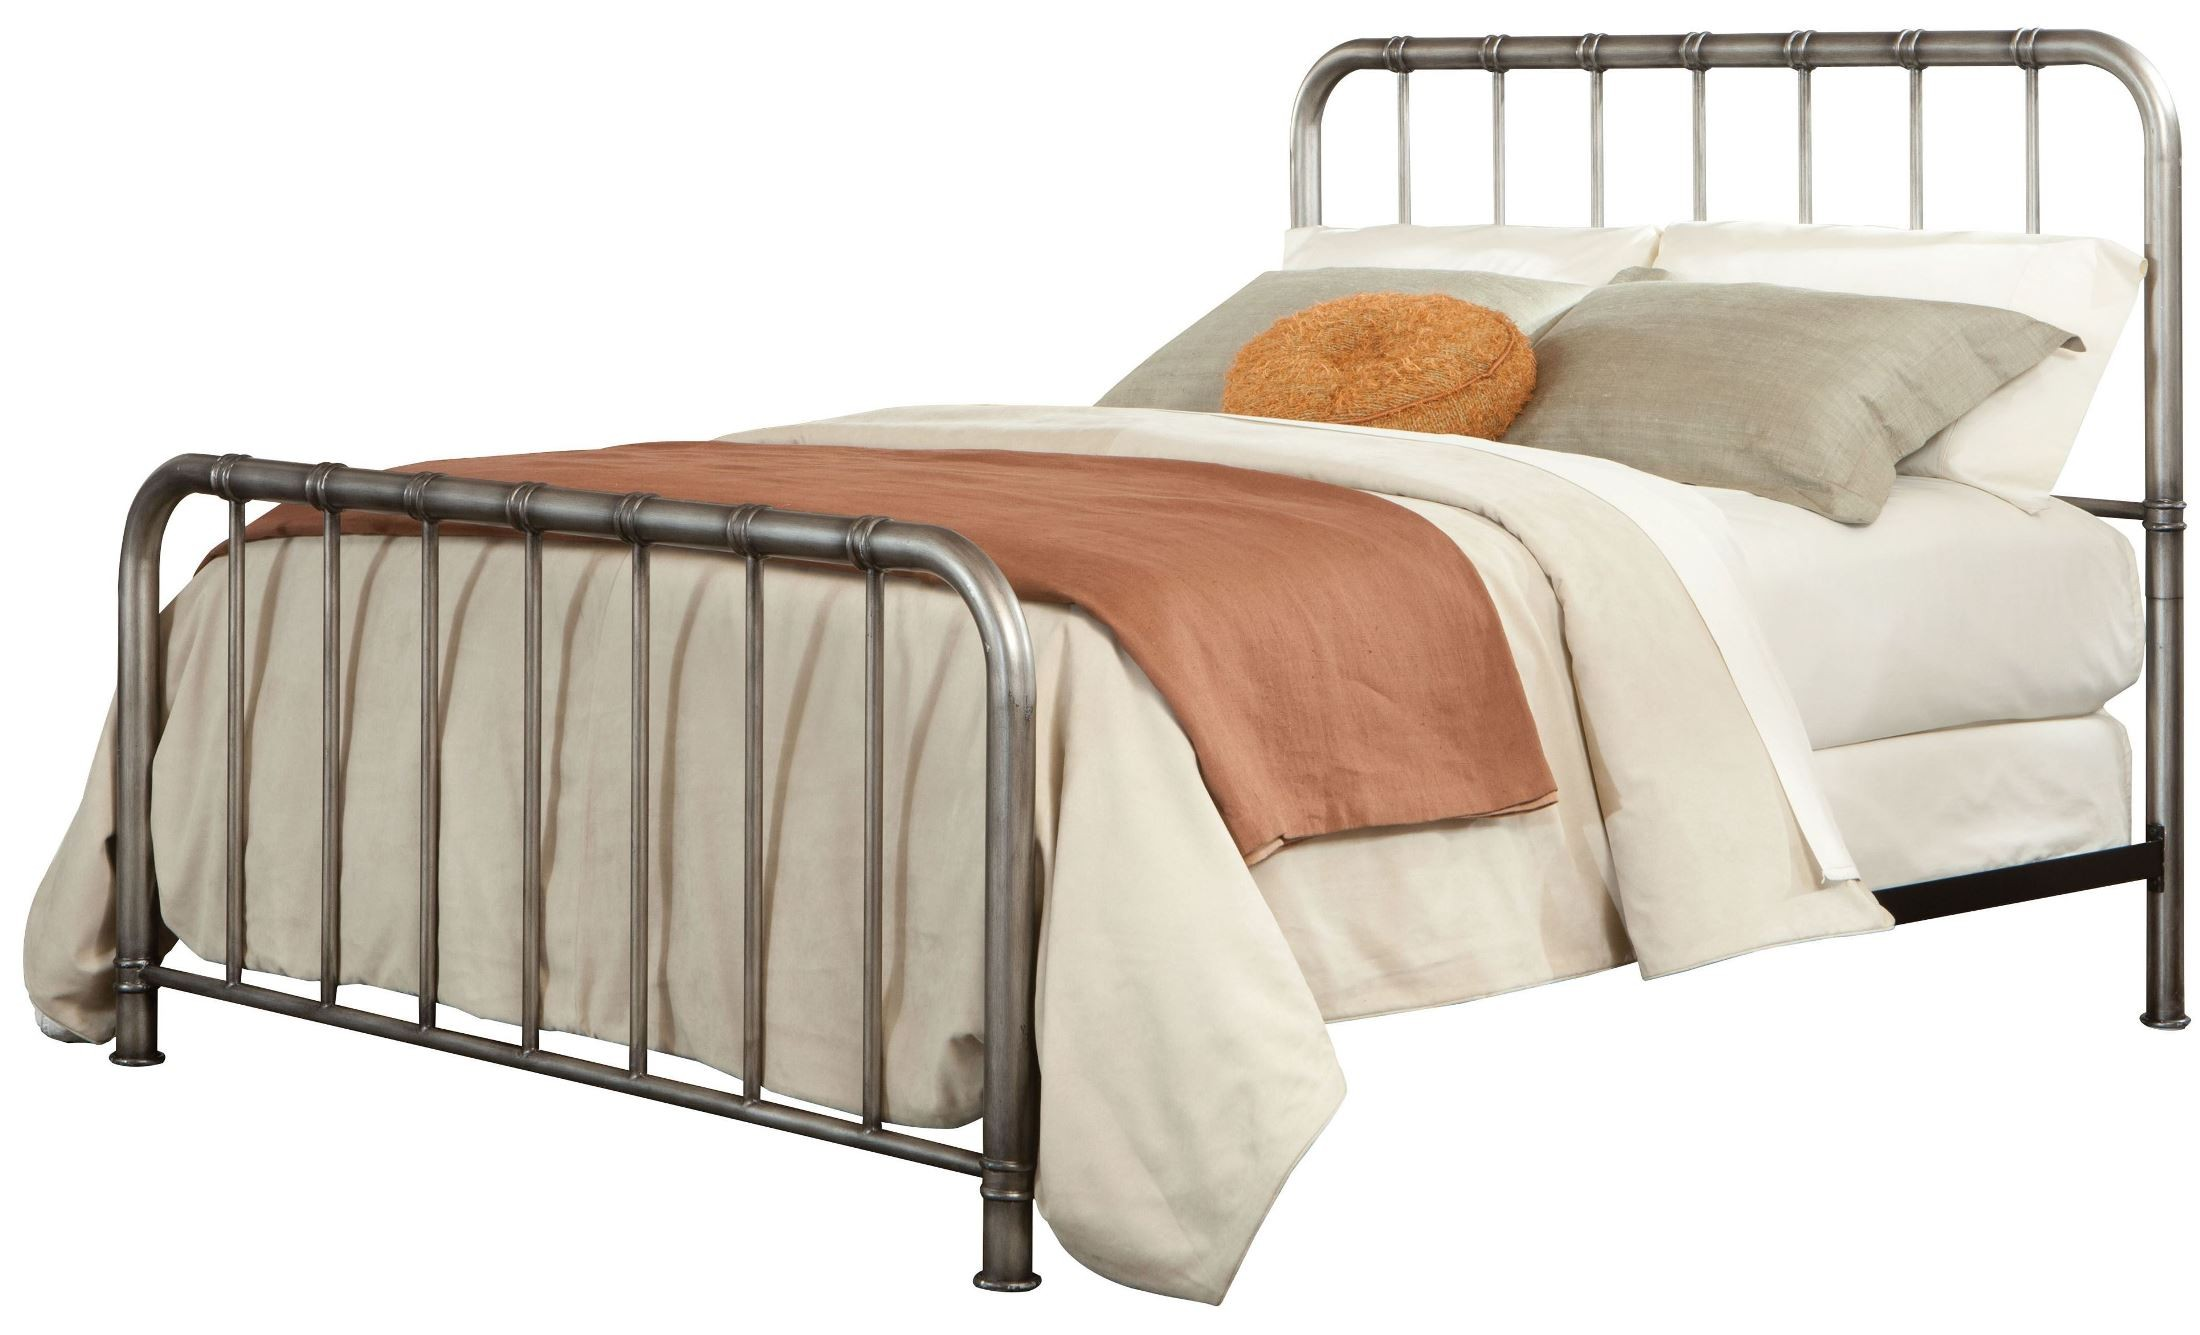 Tristen Antique Pewter King Metal Bed From Standard